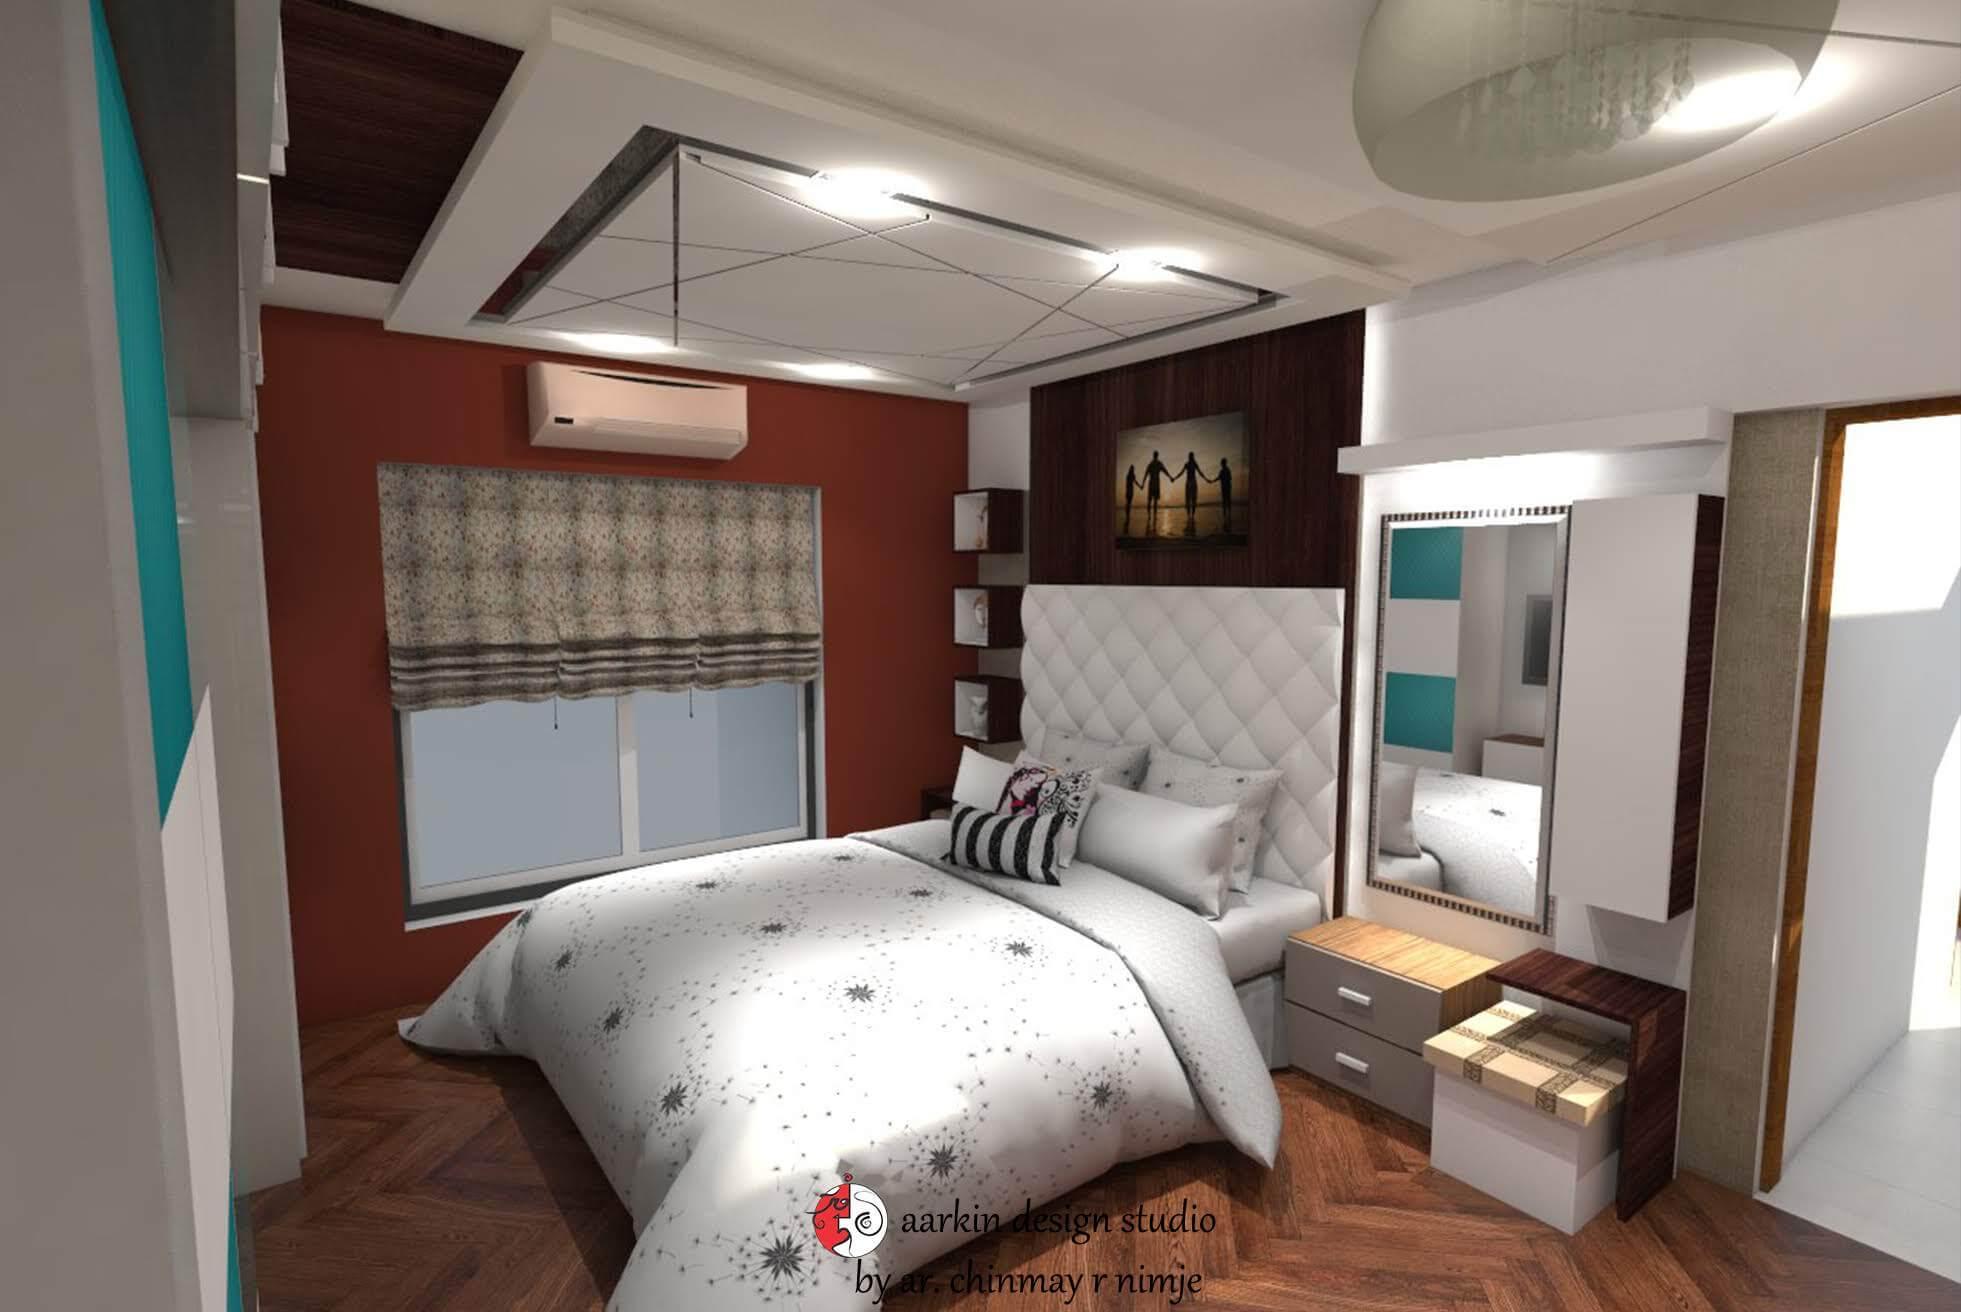 master bedroom design showing bed bed back and laminate flooring